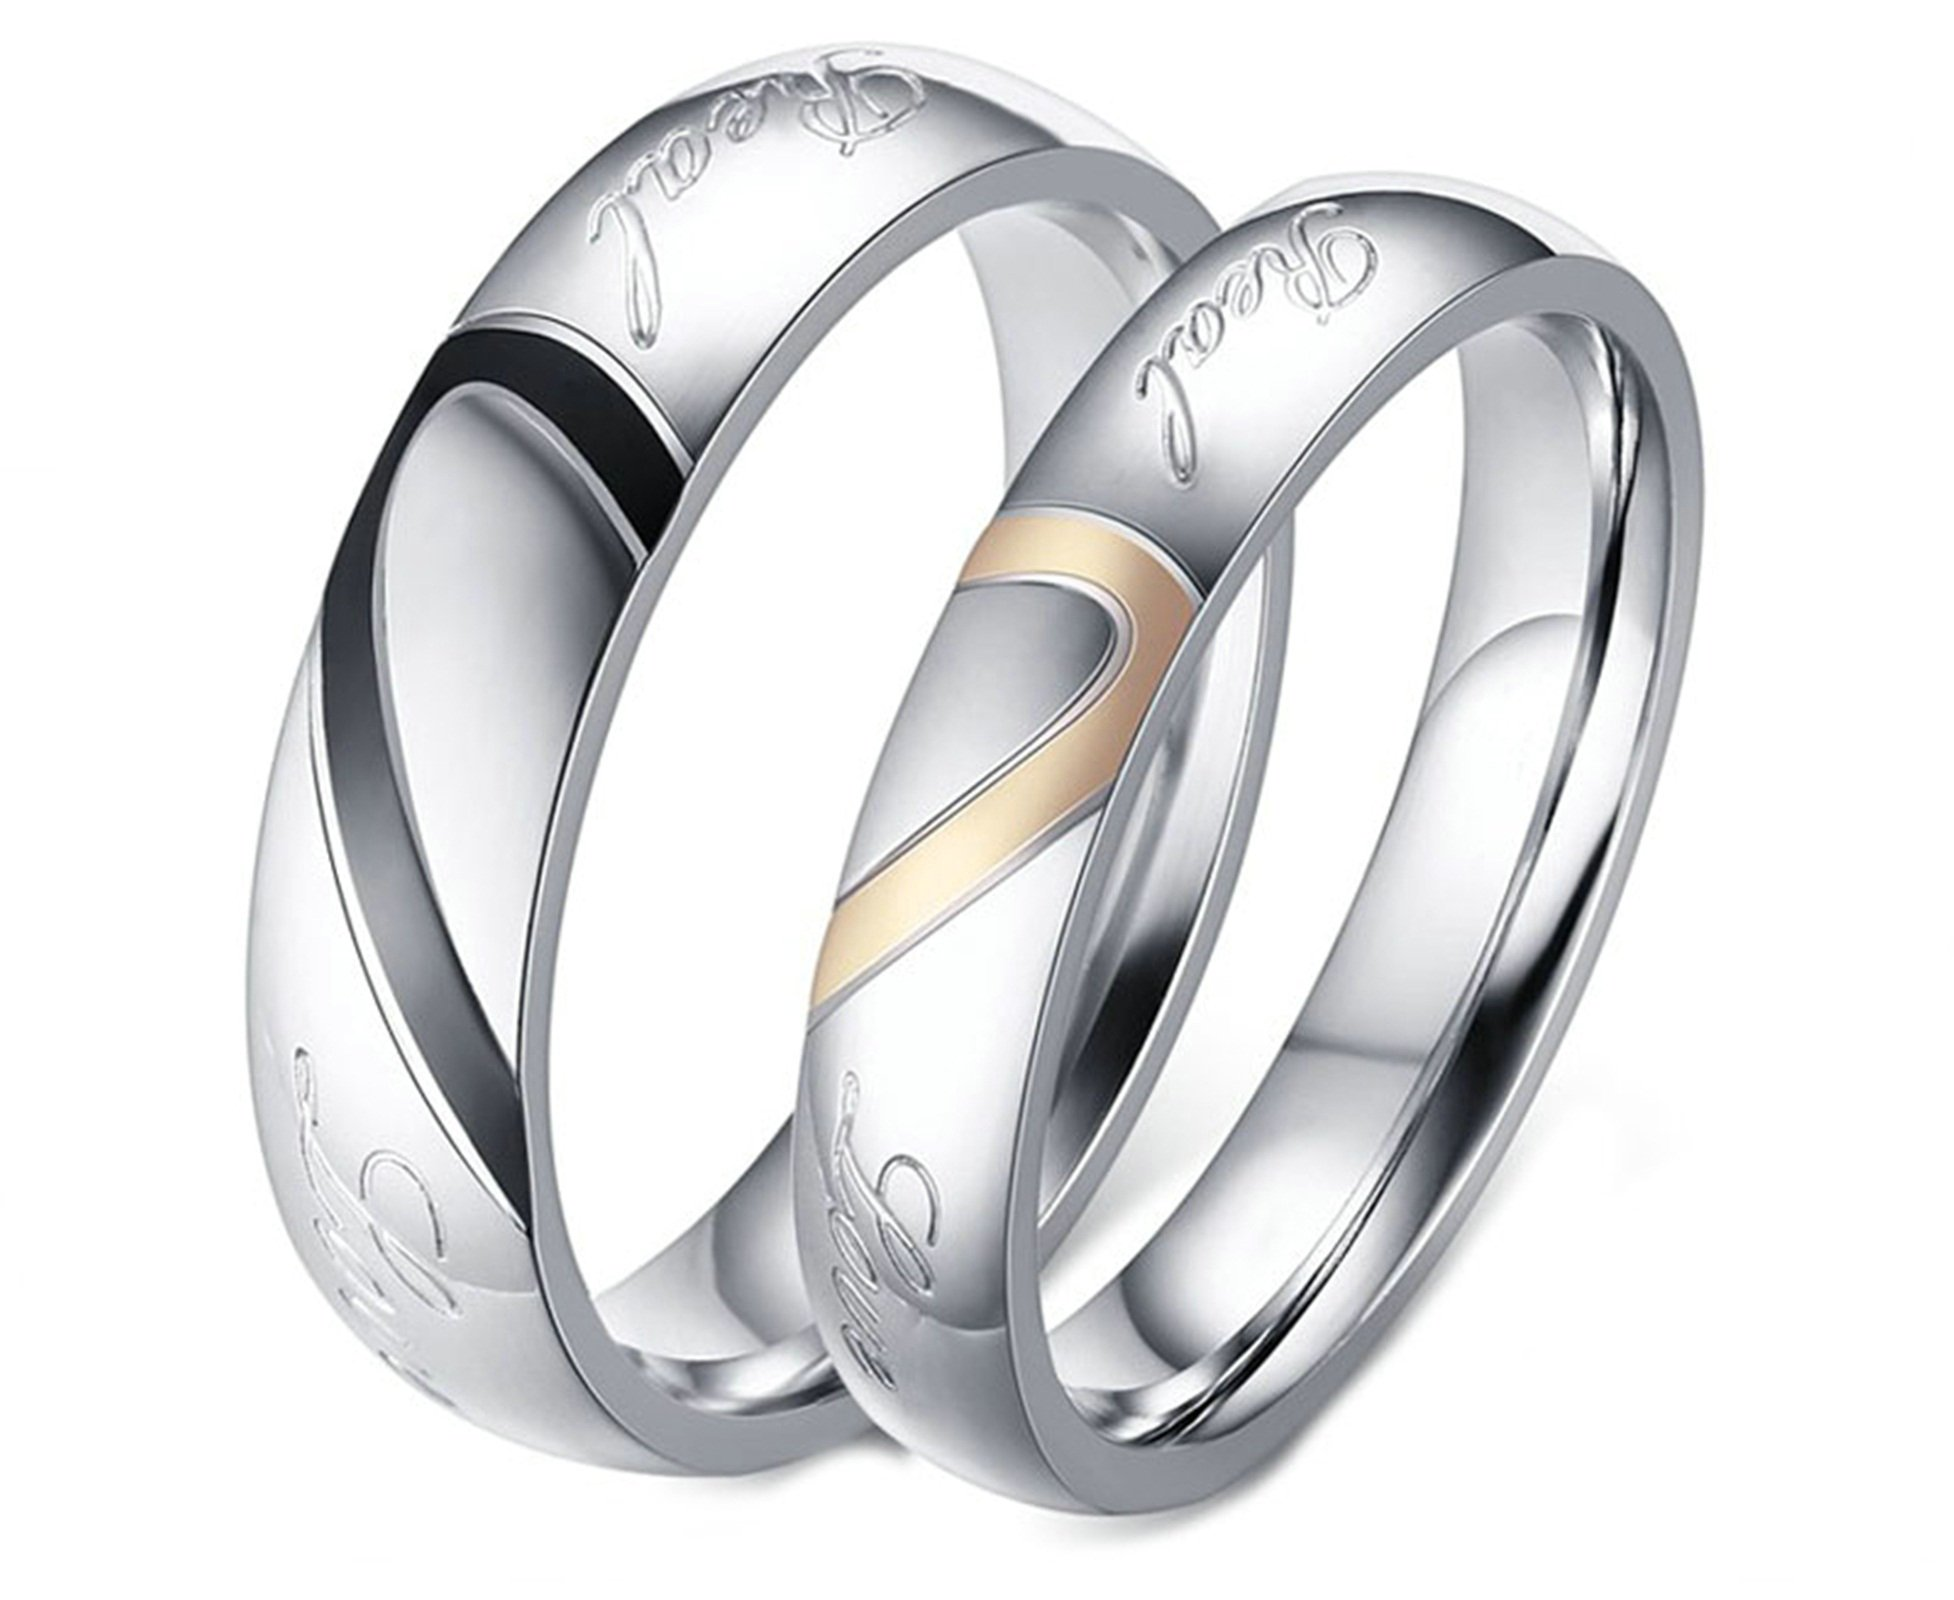 Aooaz Stainless Steel Rings Wedding Rings Friendship Rings Women Rings Men Rings Silver Love Heart Puzzle Rings Free Engraving Womens 6 & Men 6 Novelty Jewelry Gift